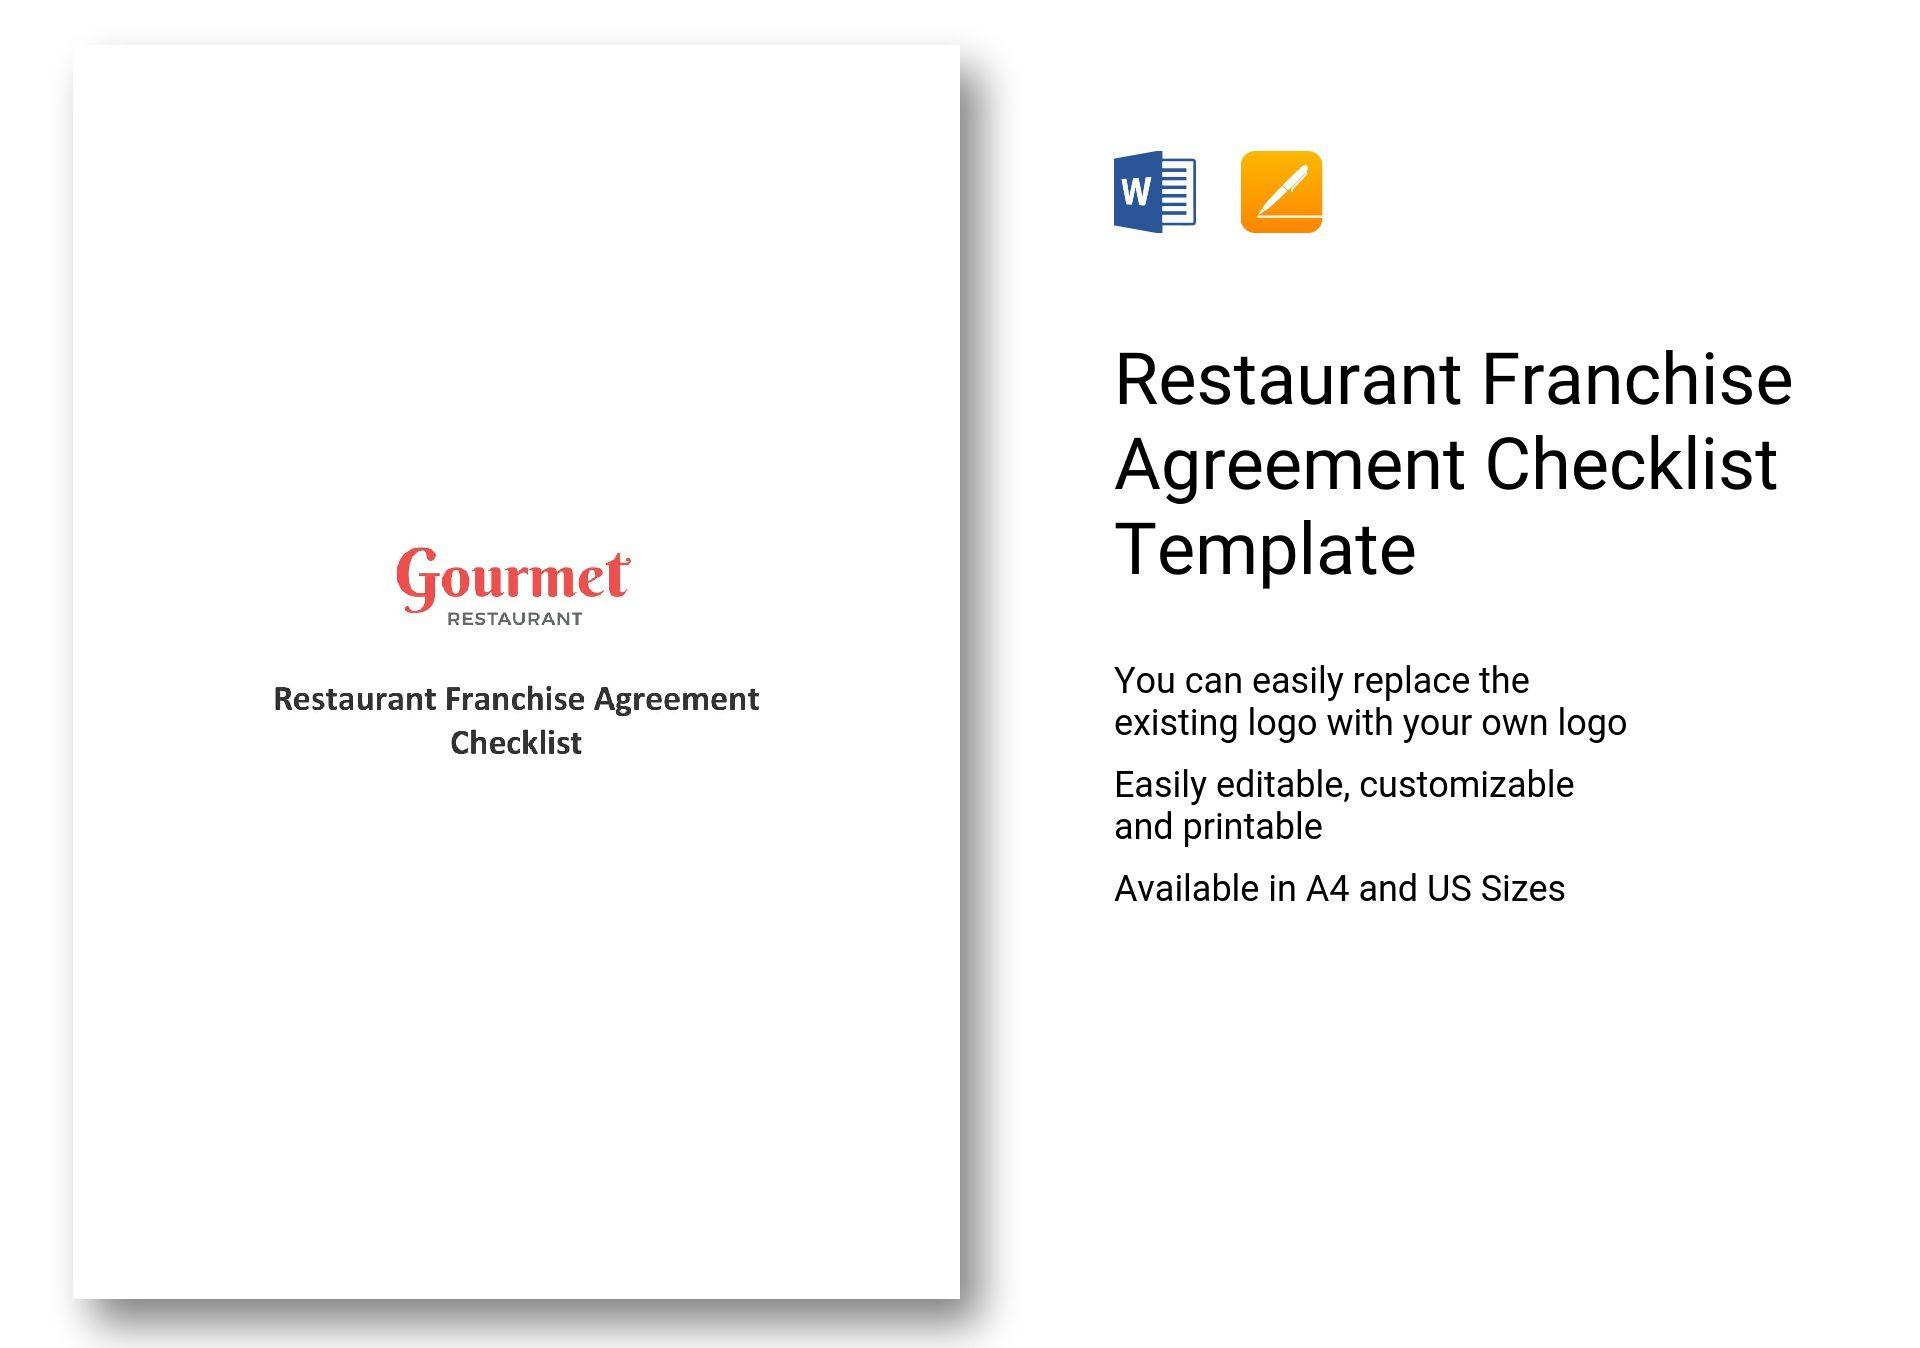 Restaurant Franchise Agreement Checklist Template In Word